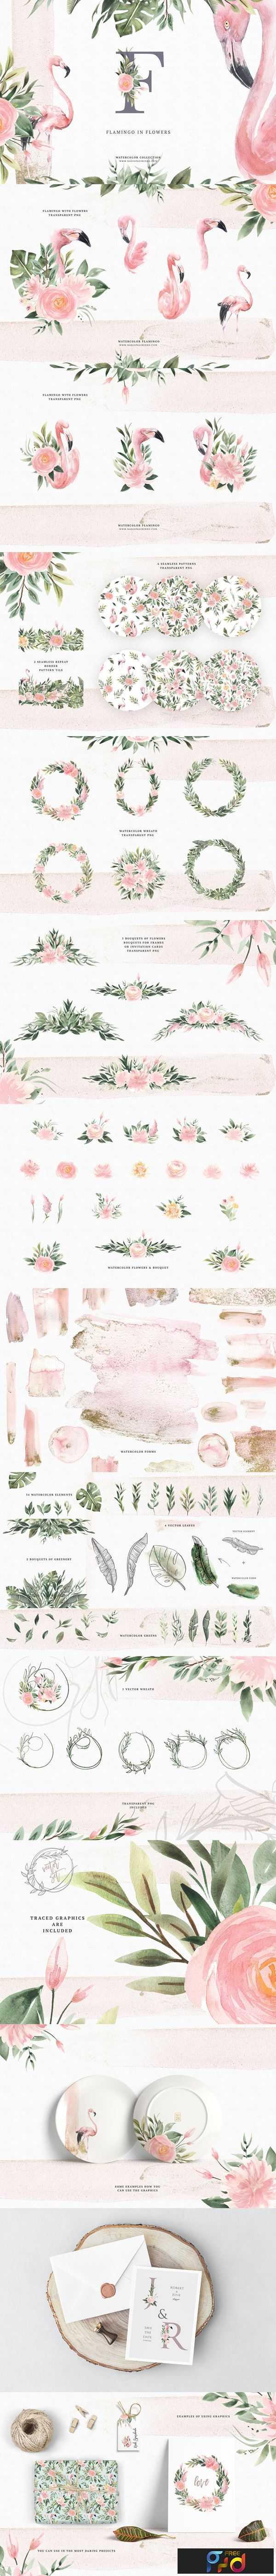 1806277 Watercolor Flamingo & Flowers 2511087 1